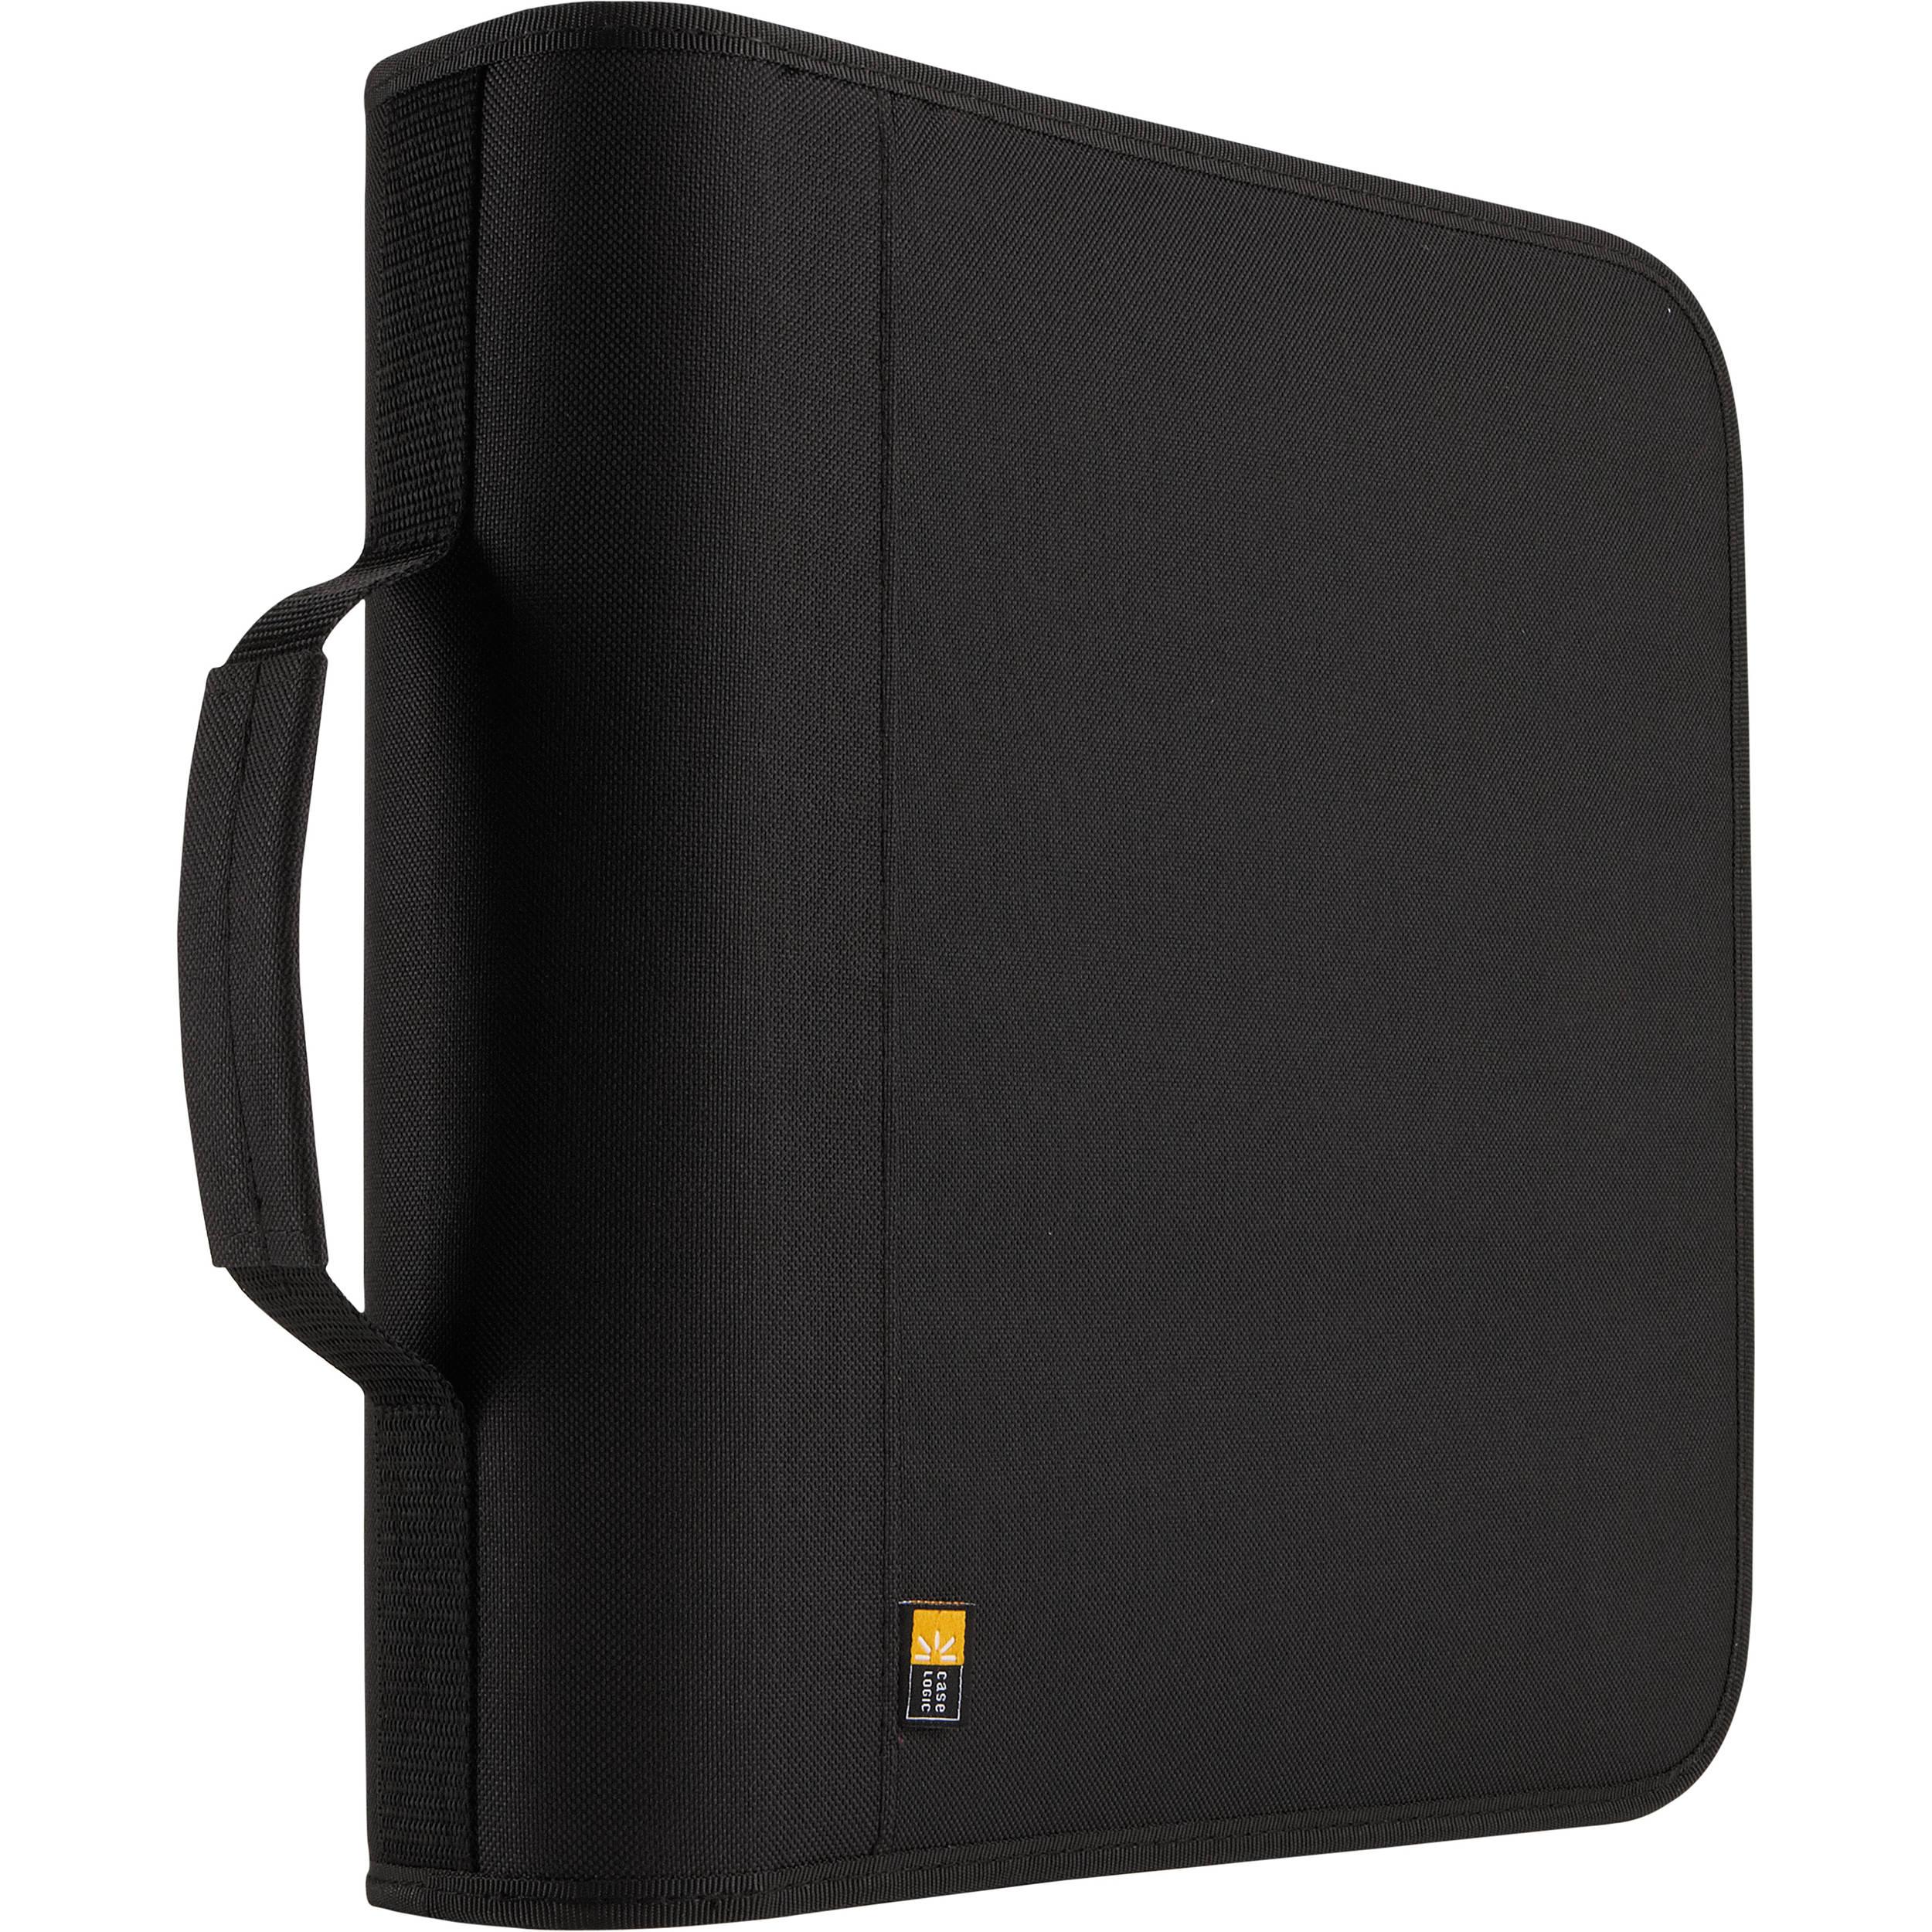 Merveilleux Case Logic 208 Disc Nylon CD / DVD Binder (Black)